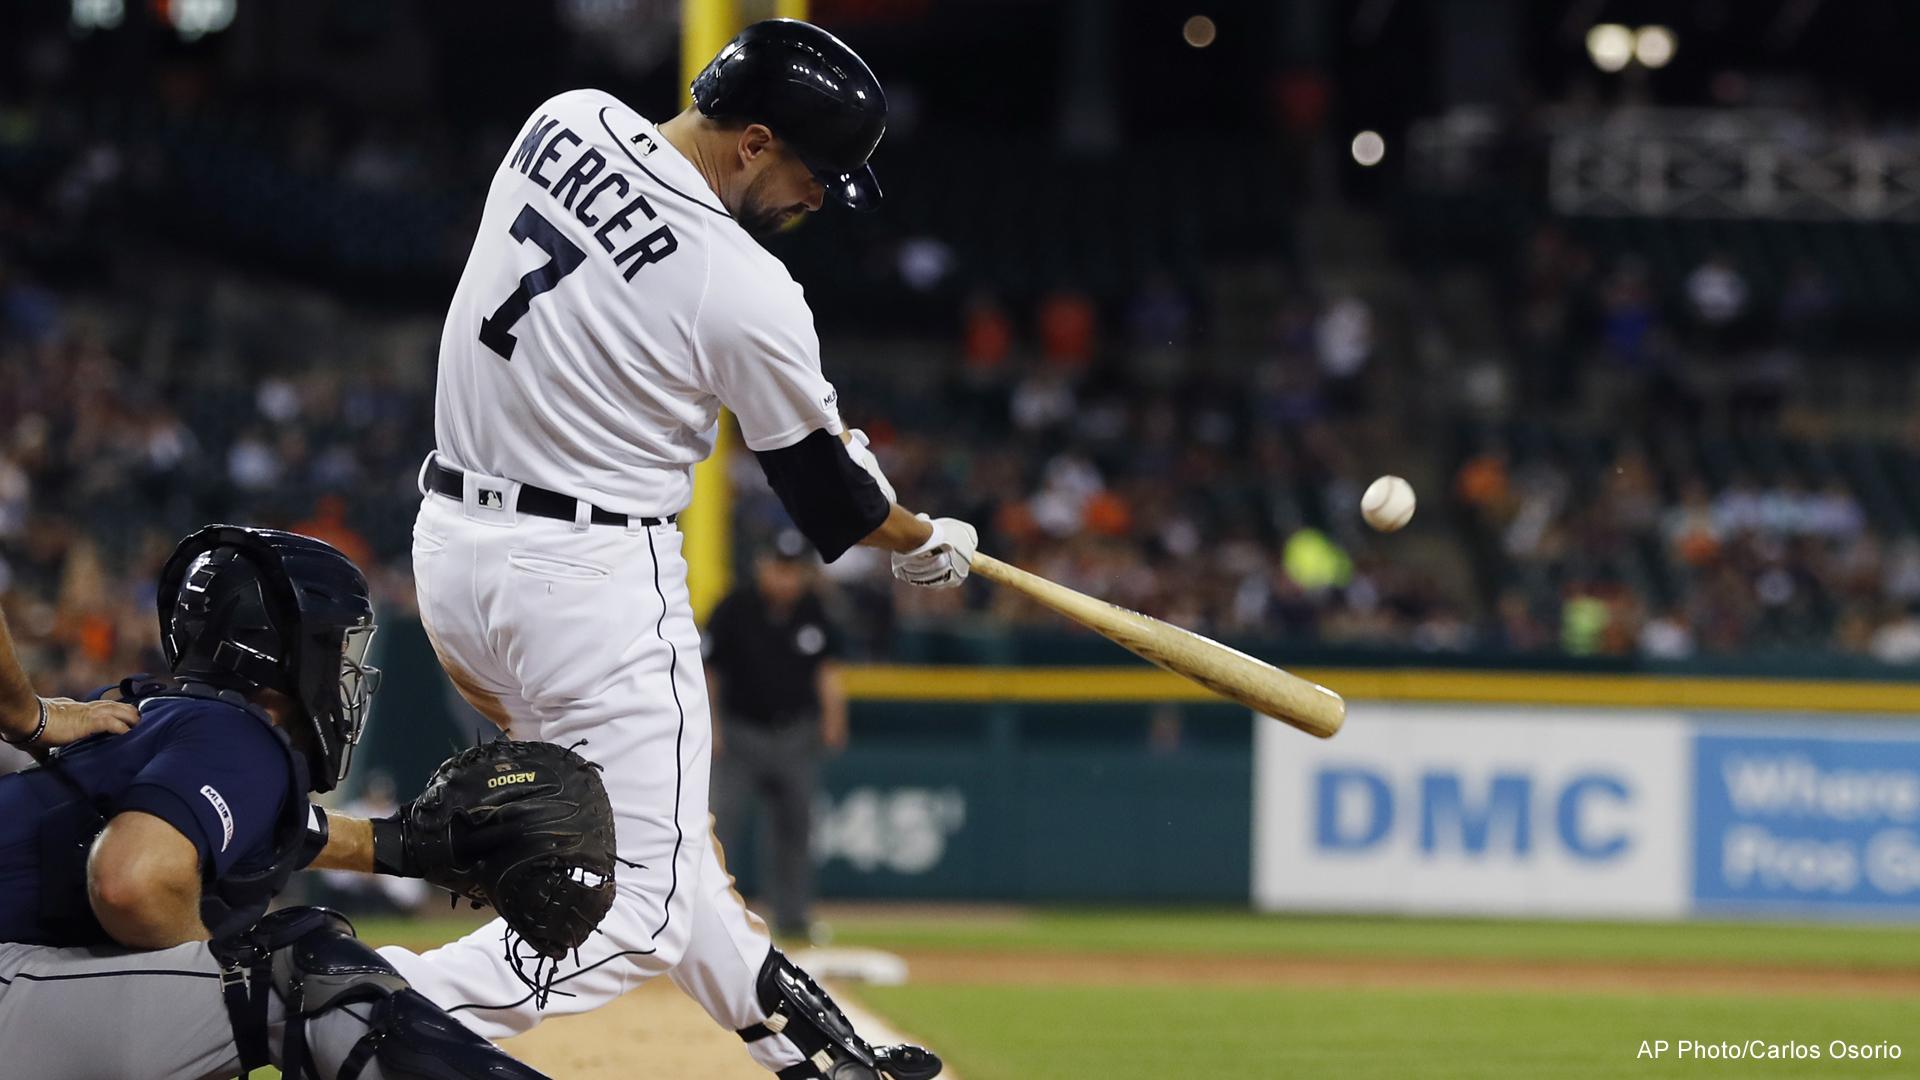 Detroit Tigers Jordy Mercer